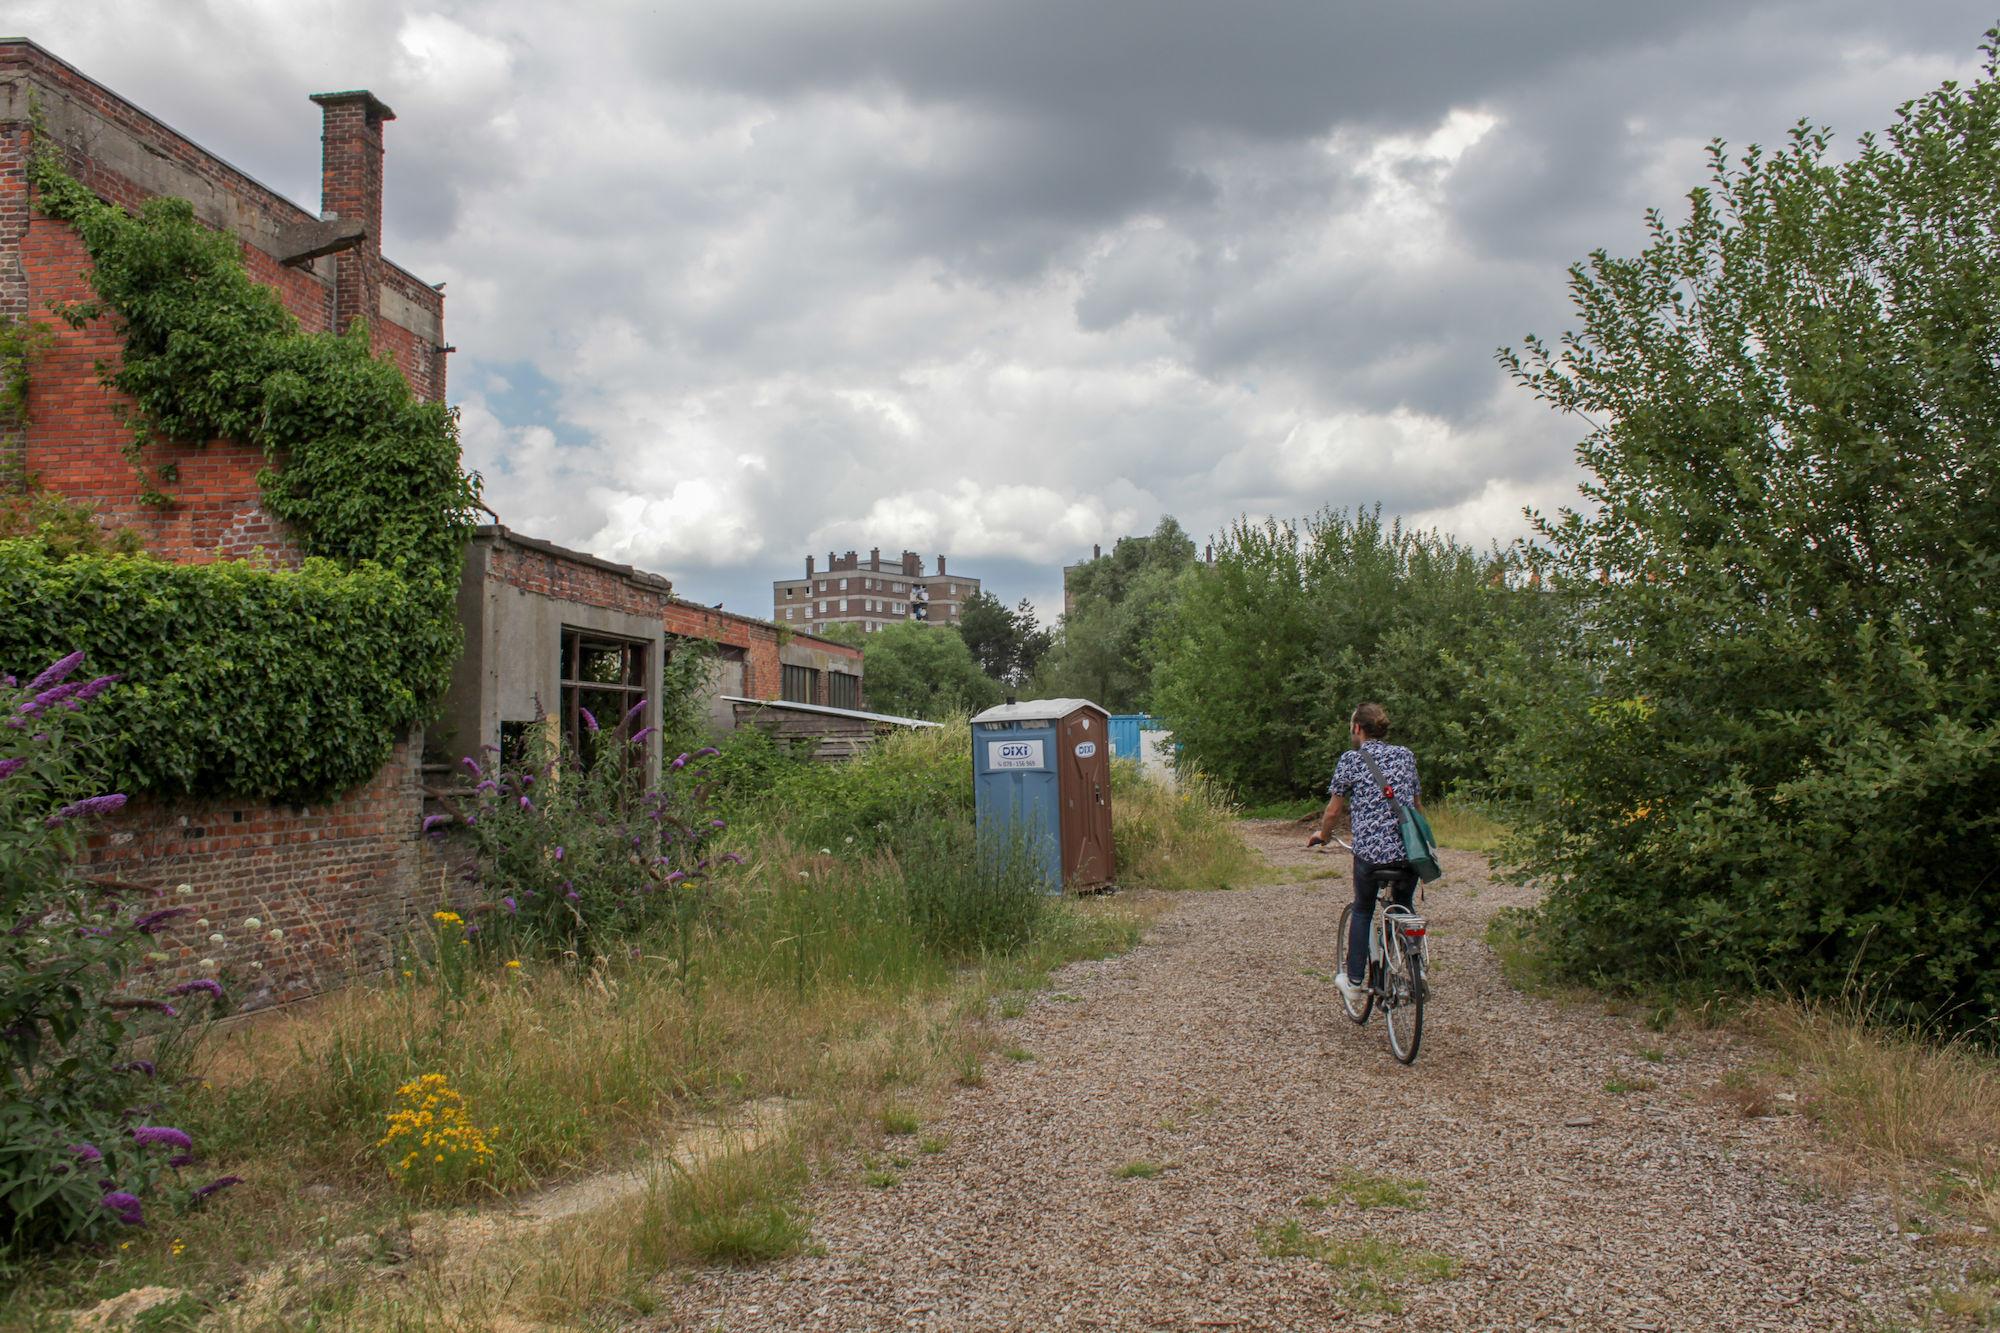 2019-07-02 Muide Meulestede prospectie Wannes_stadsvernieuwing_IMG_0330-3.jpg